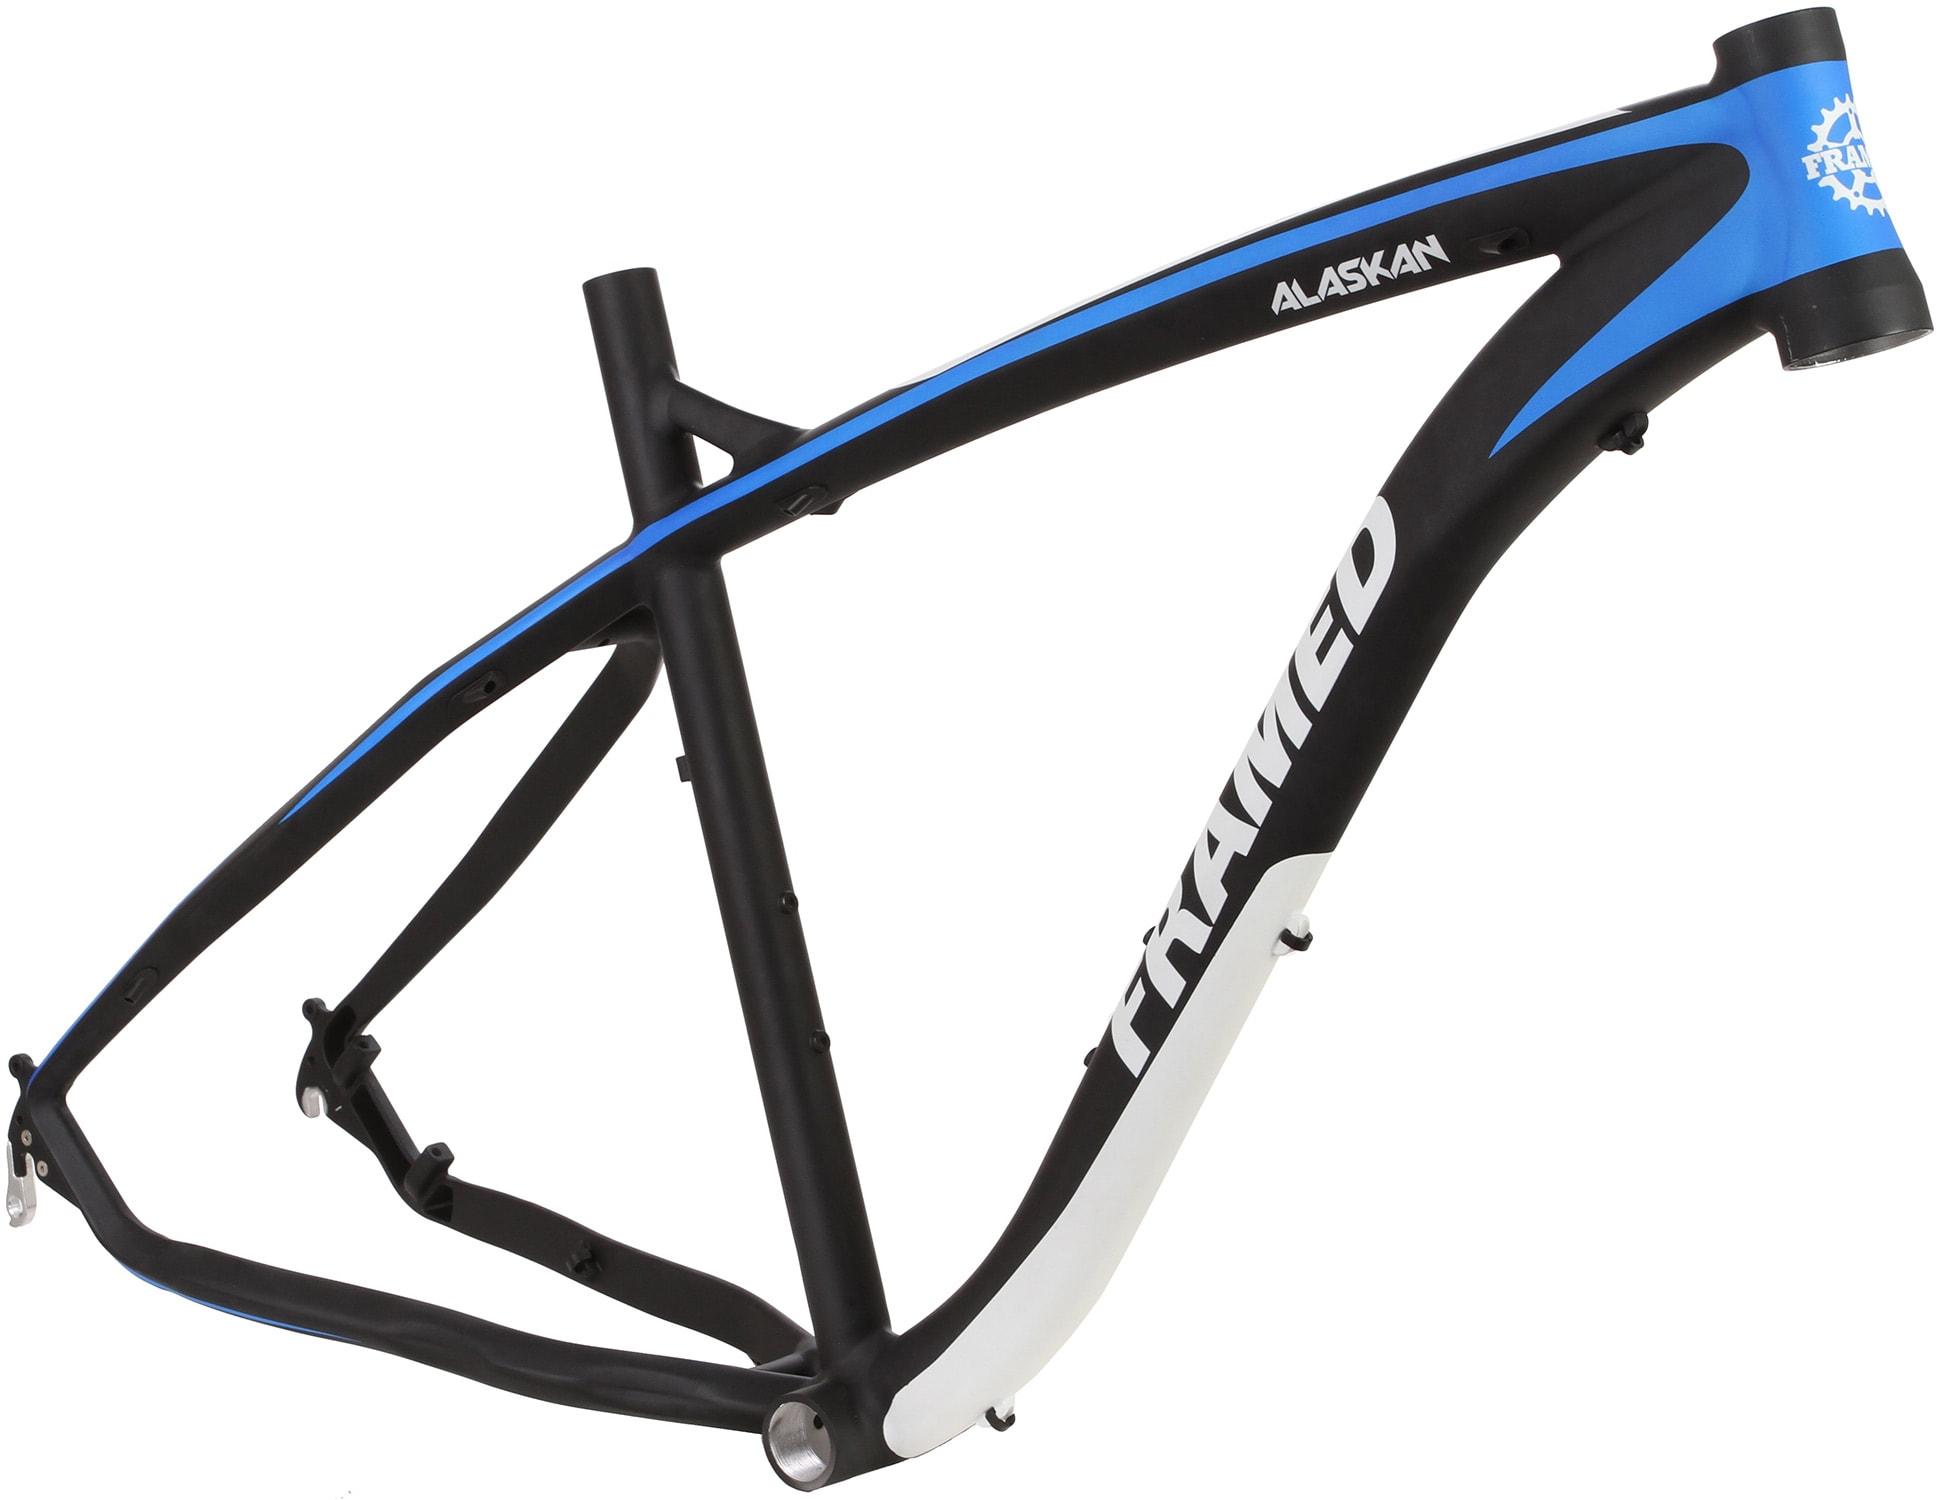 on sale framed alaskan alloy w bluto fork fat bike up to 45 off framed alloy bluto build